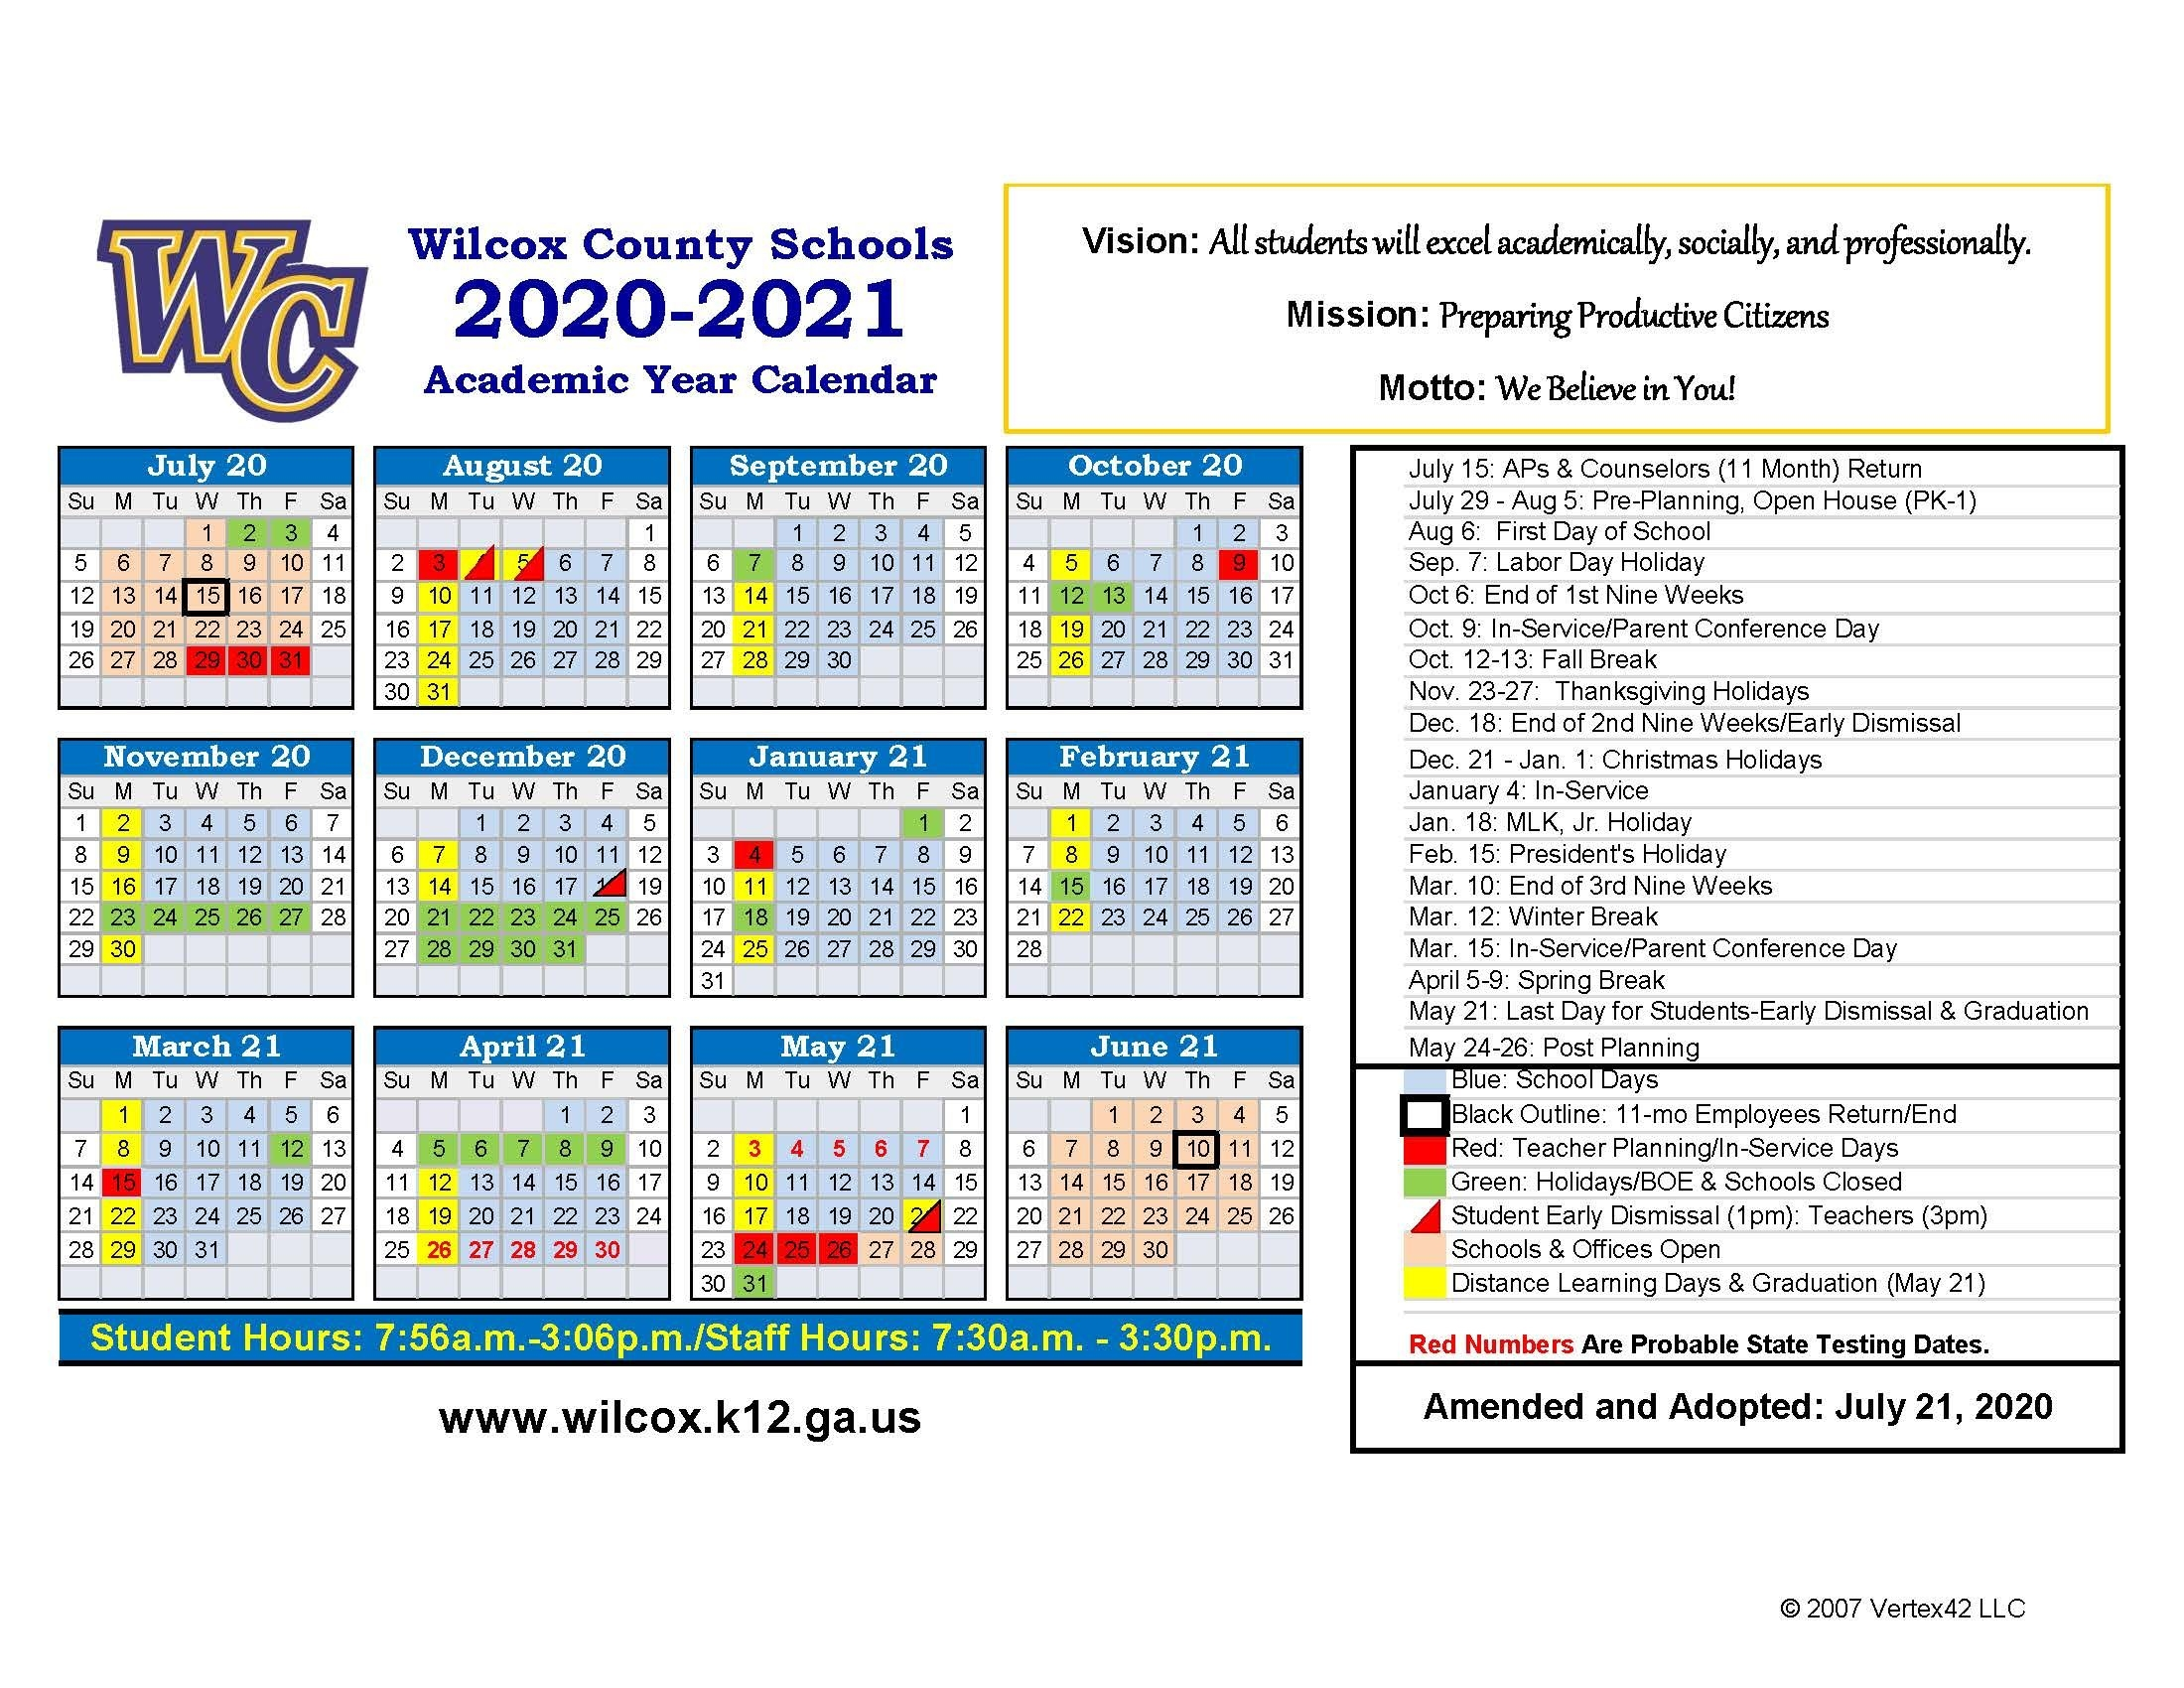 2020-2021 School Calendar (Amended 7/22/2020) - Wilcox